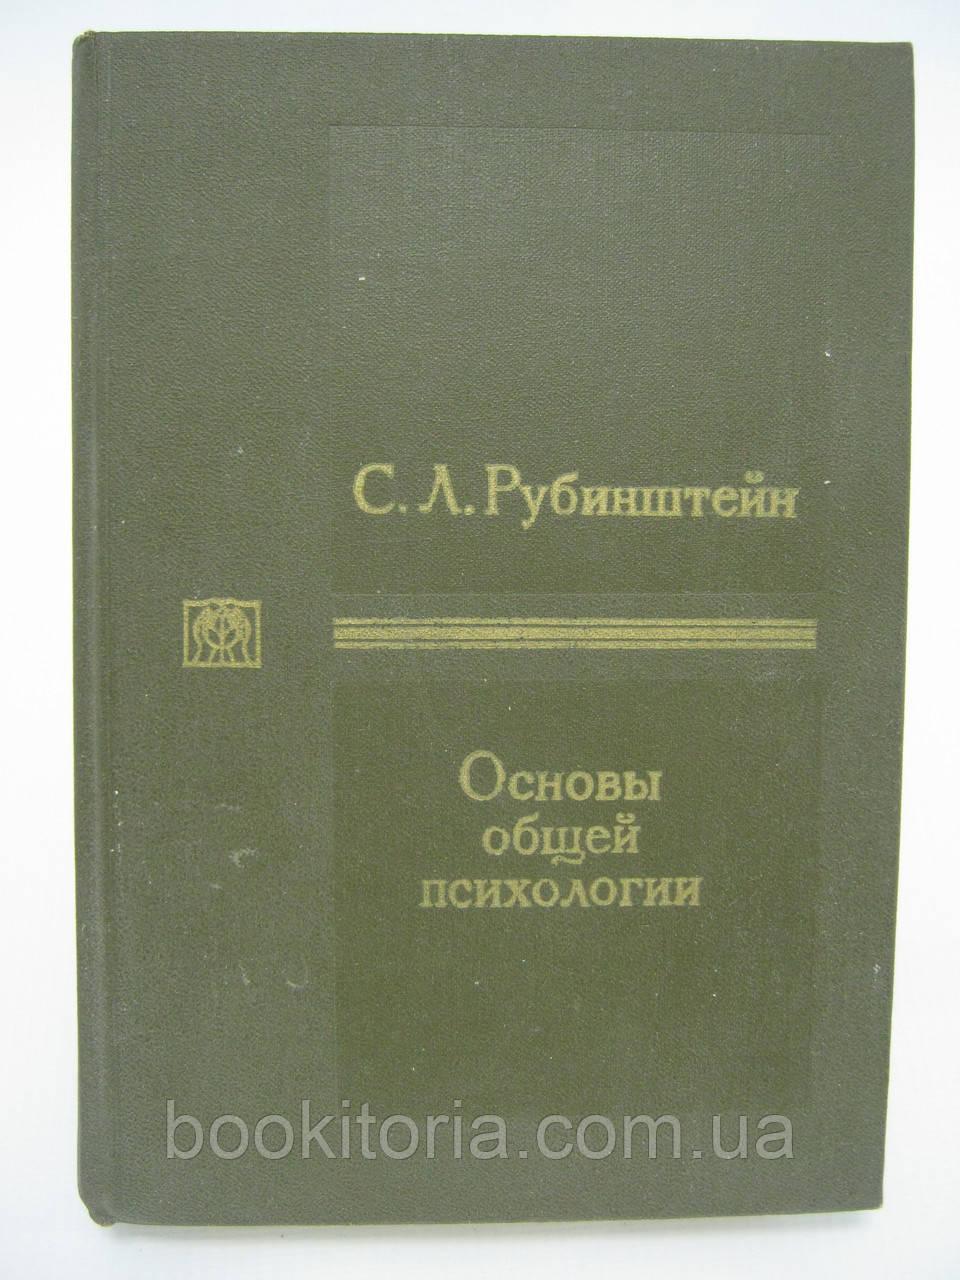 Рубинштейн С.Л. Основы общей психологии. В двух (2-х) томах. Том 1 (б/у).